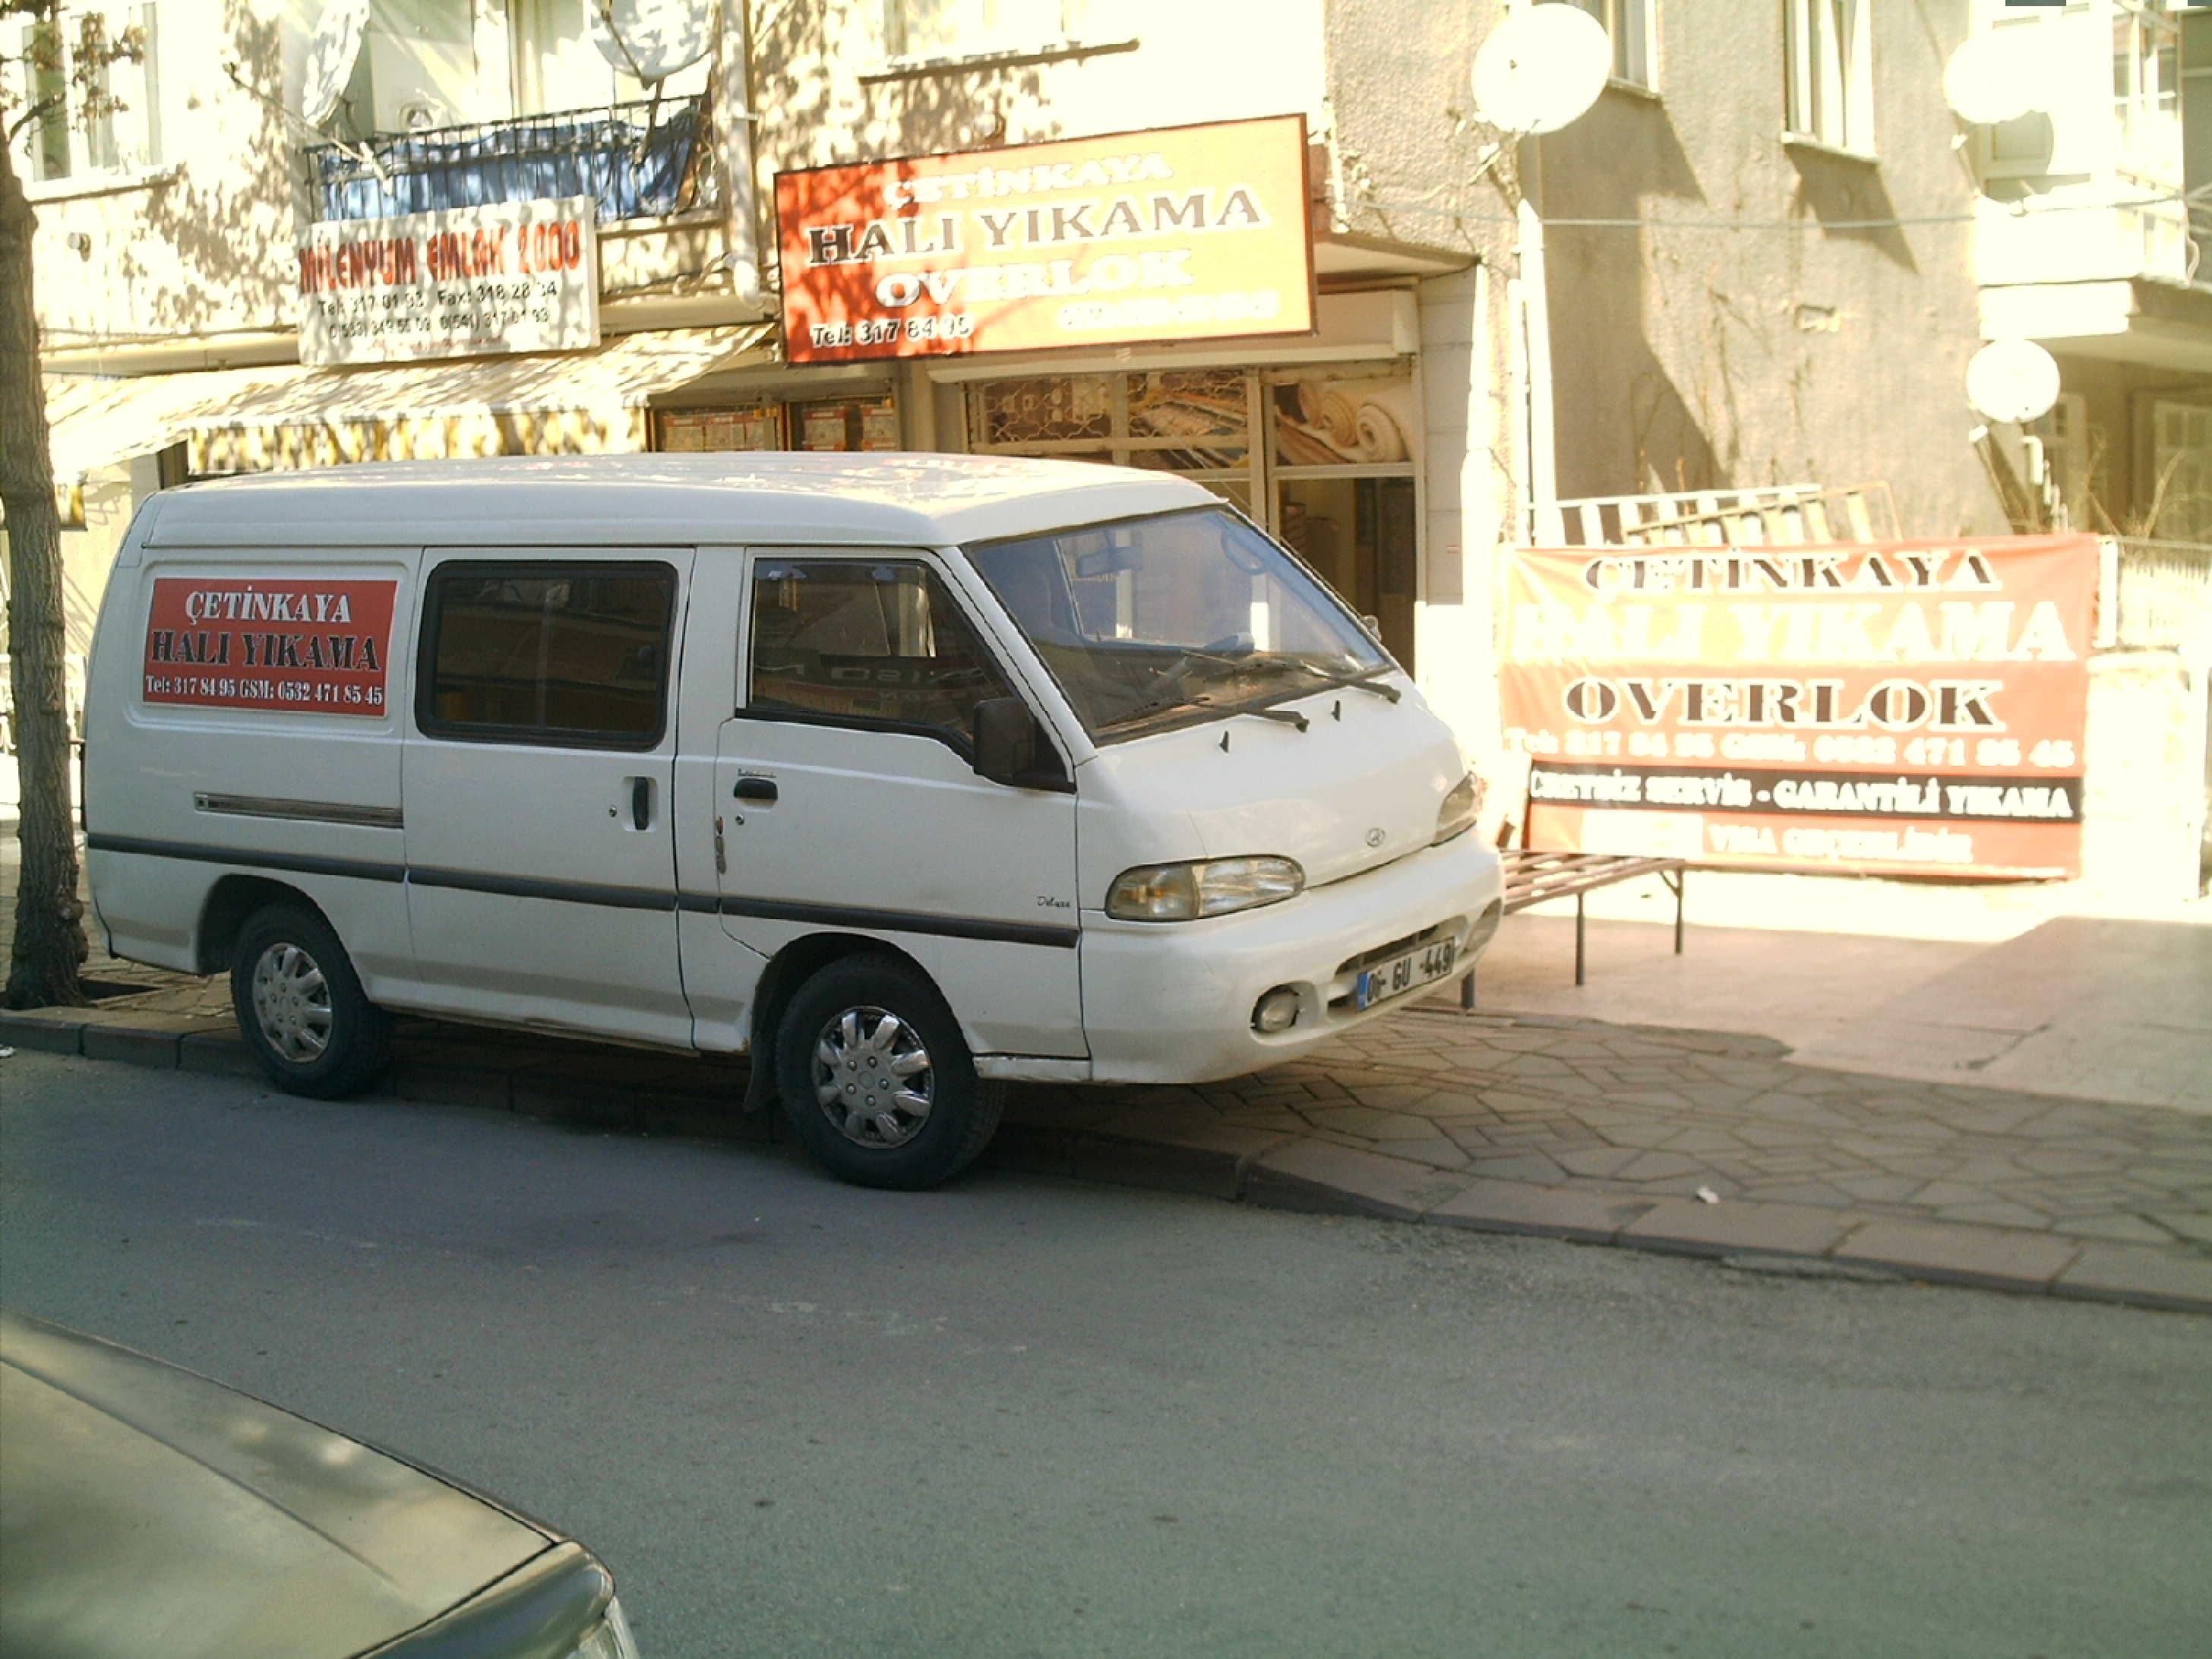 demetlale_hali_yikama_servis-1-1